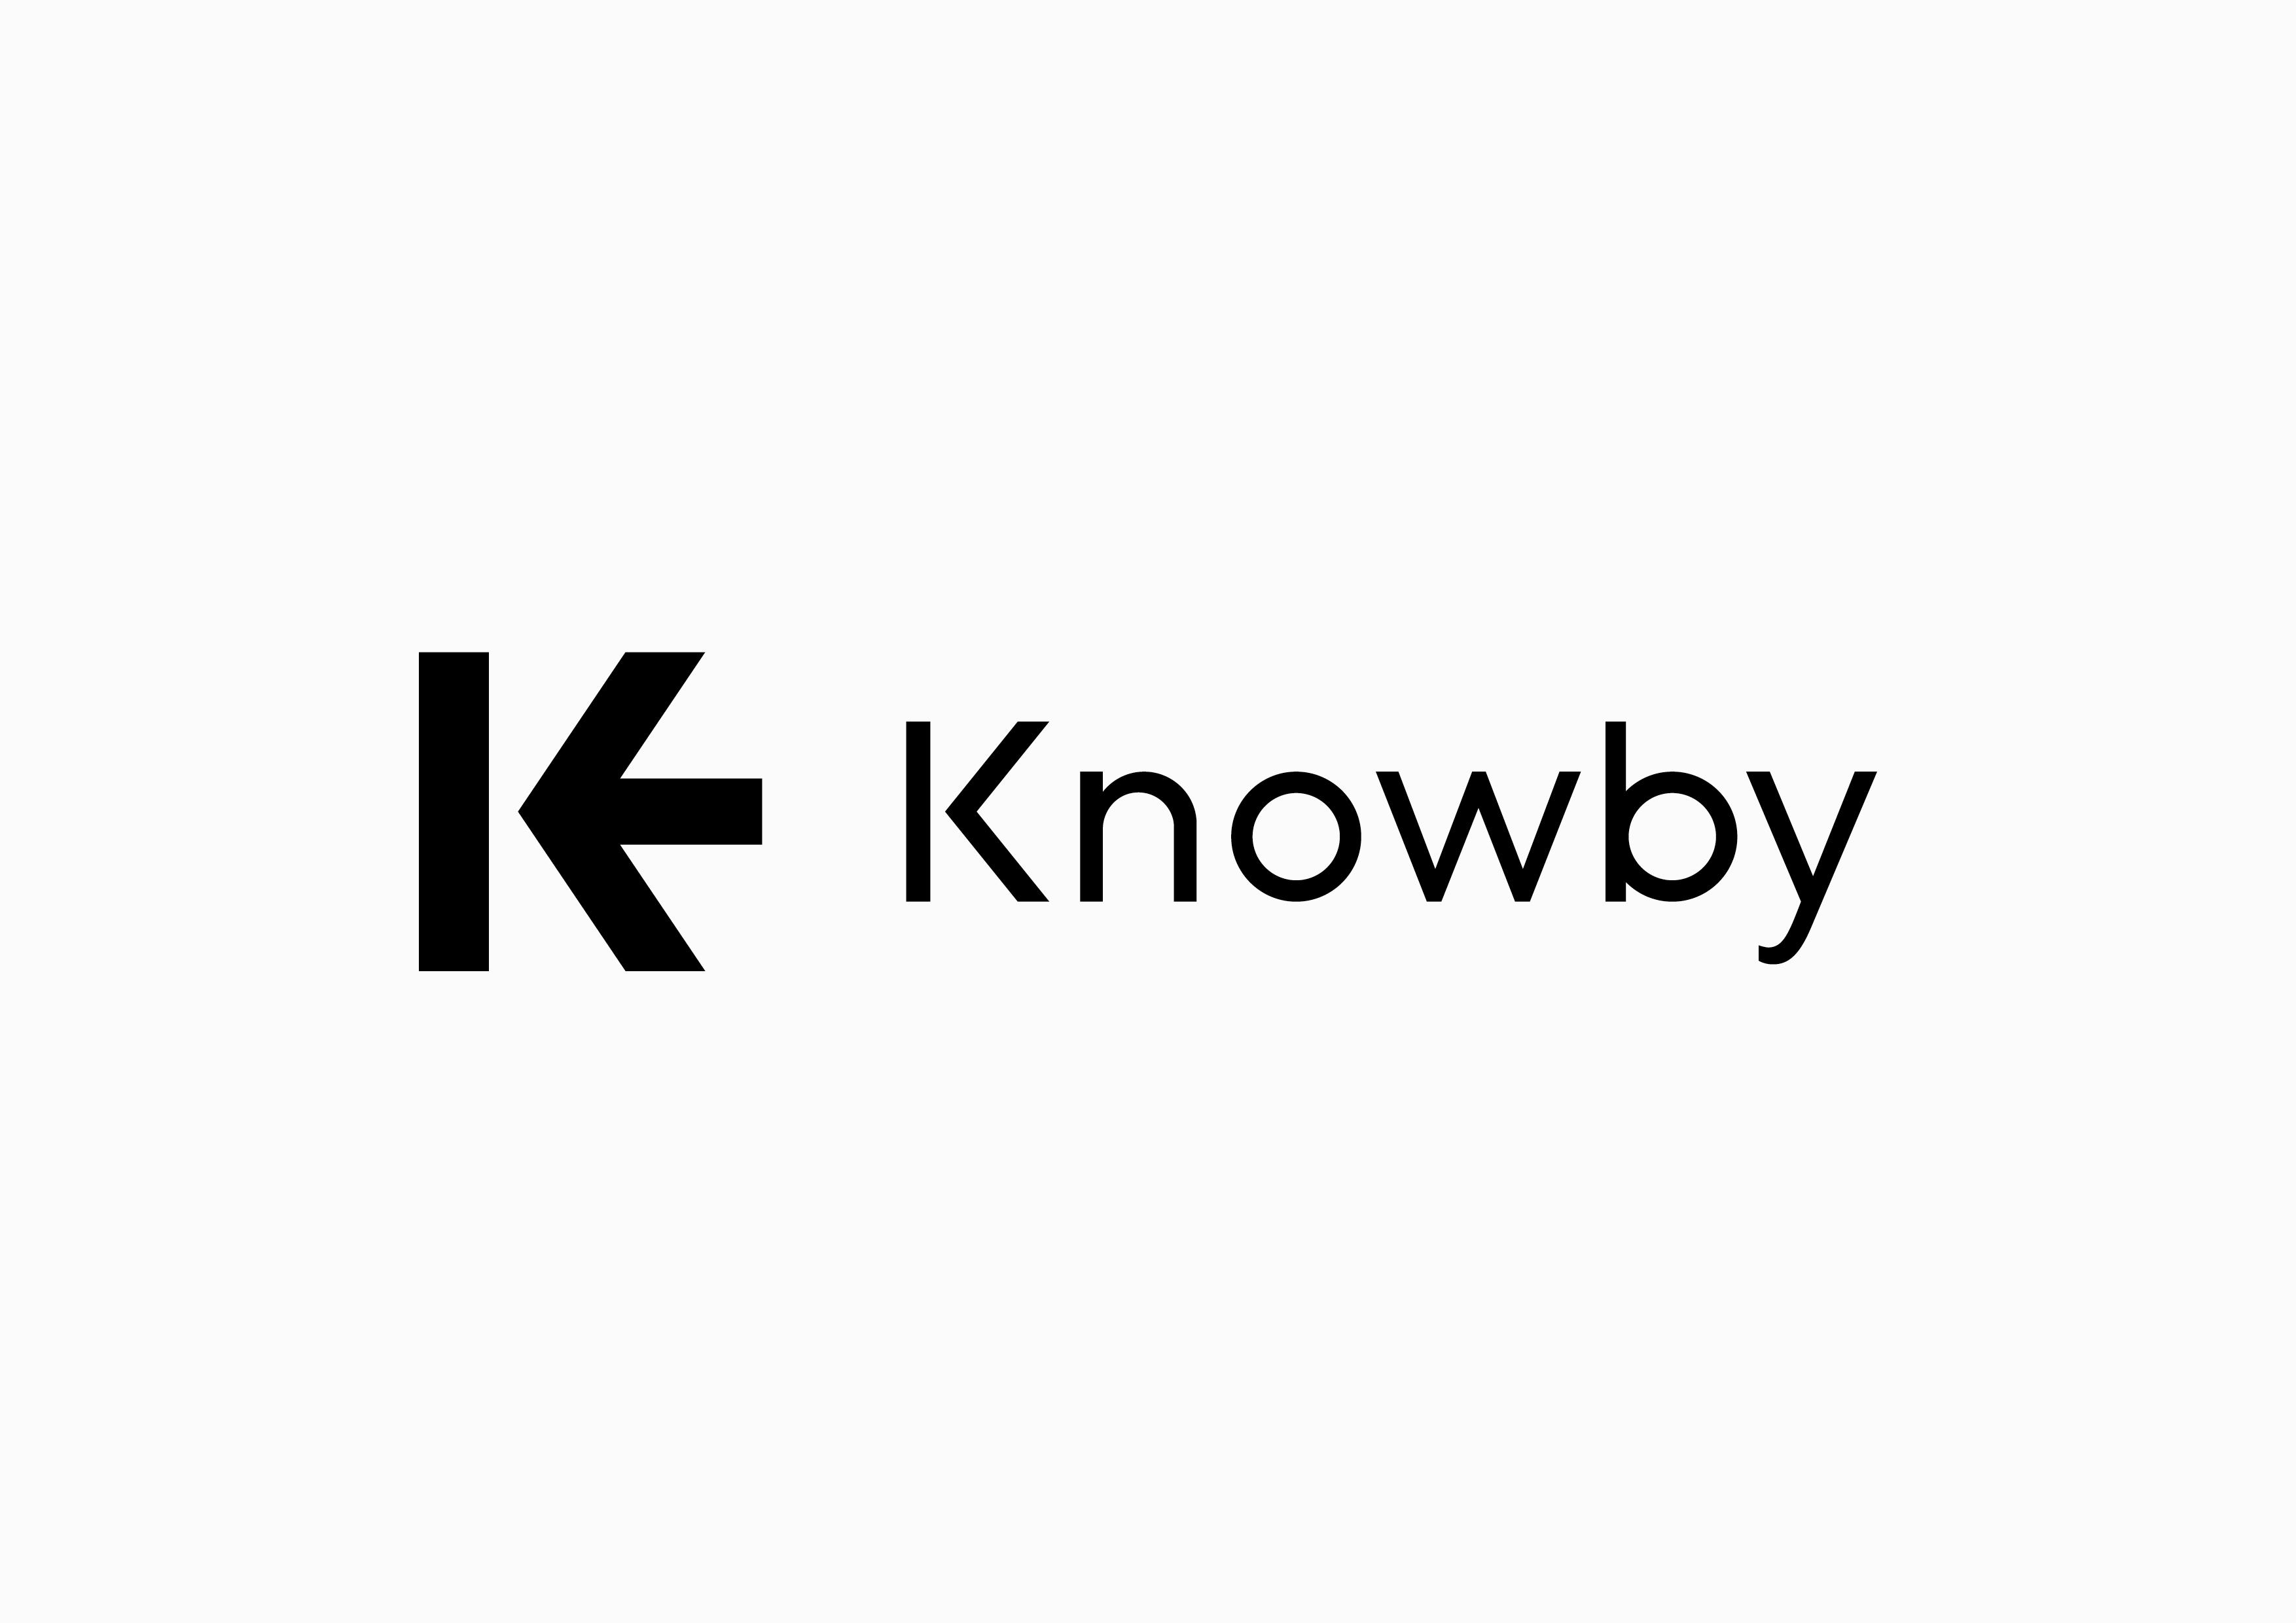 Knowby Logo Design